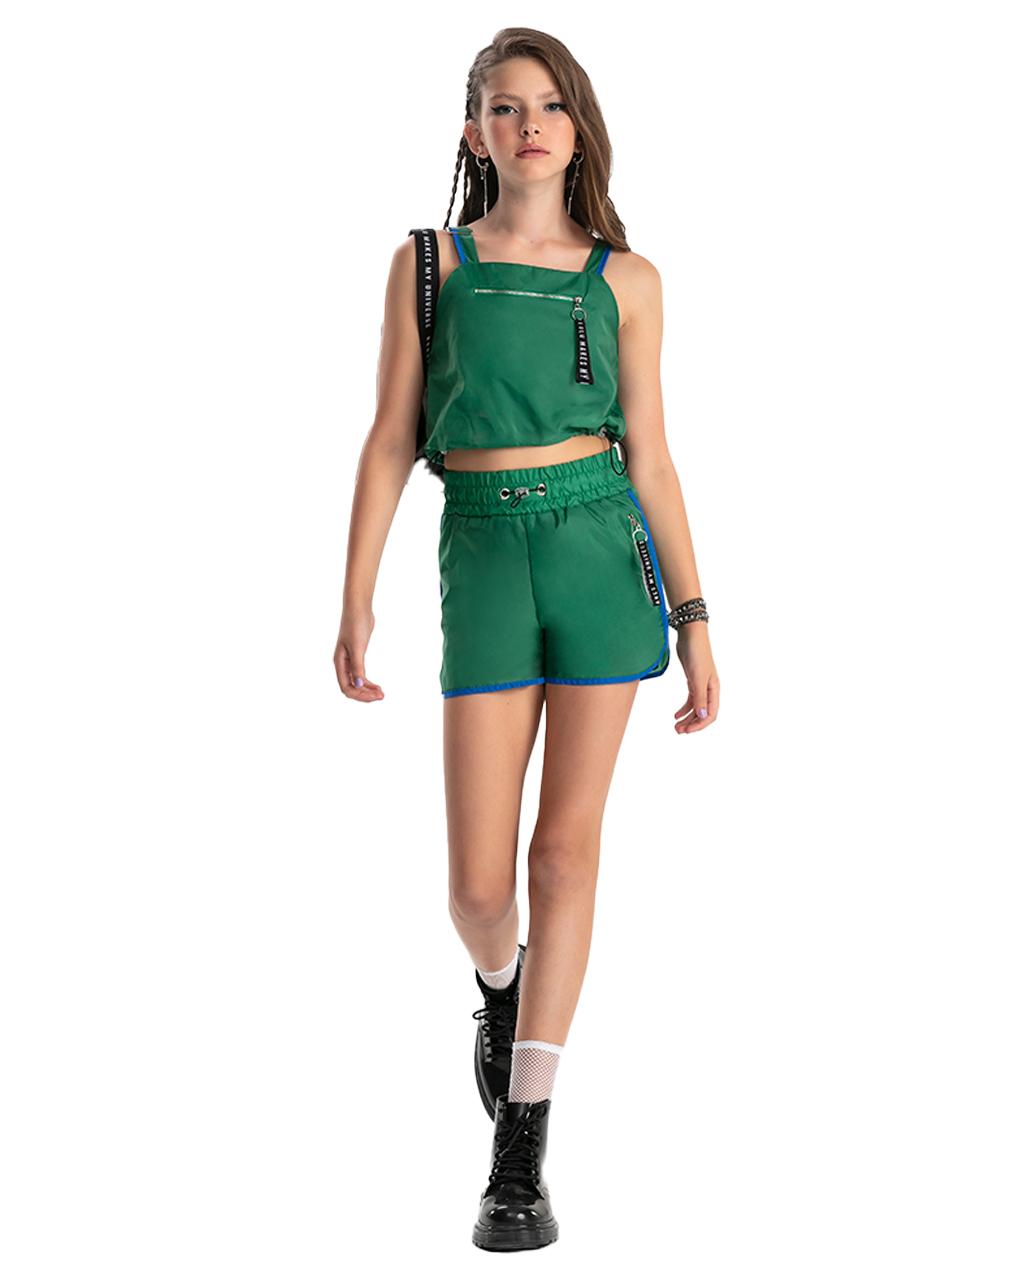 Conjunto Teen Detalhe Ziper Verde Bobbylulu